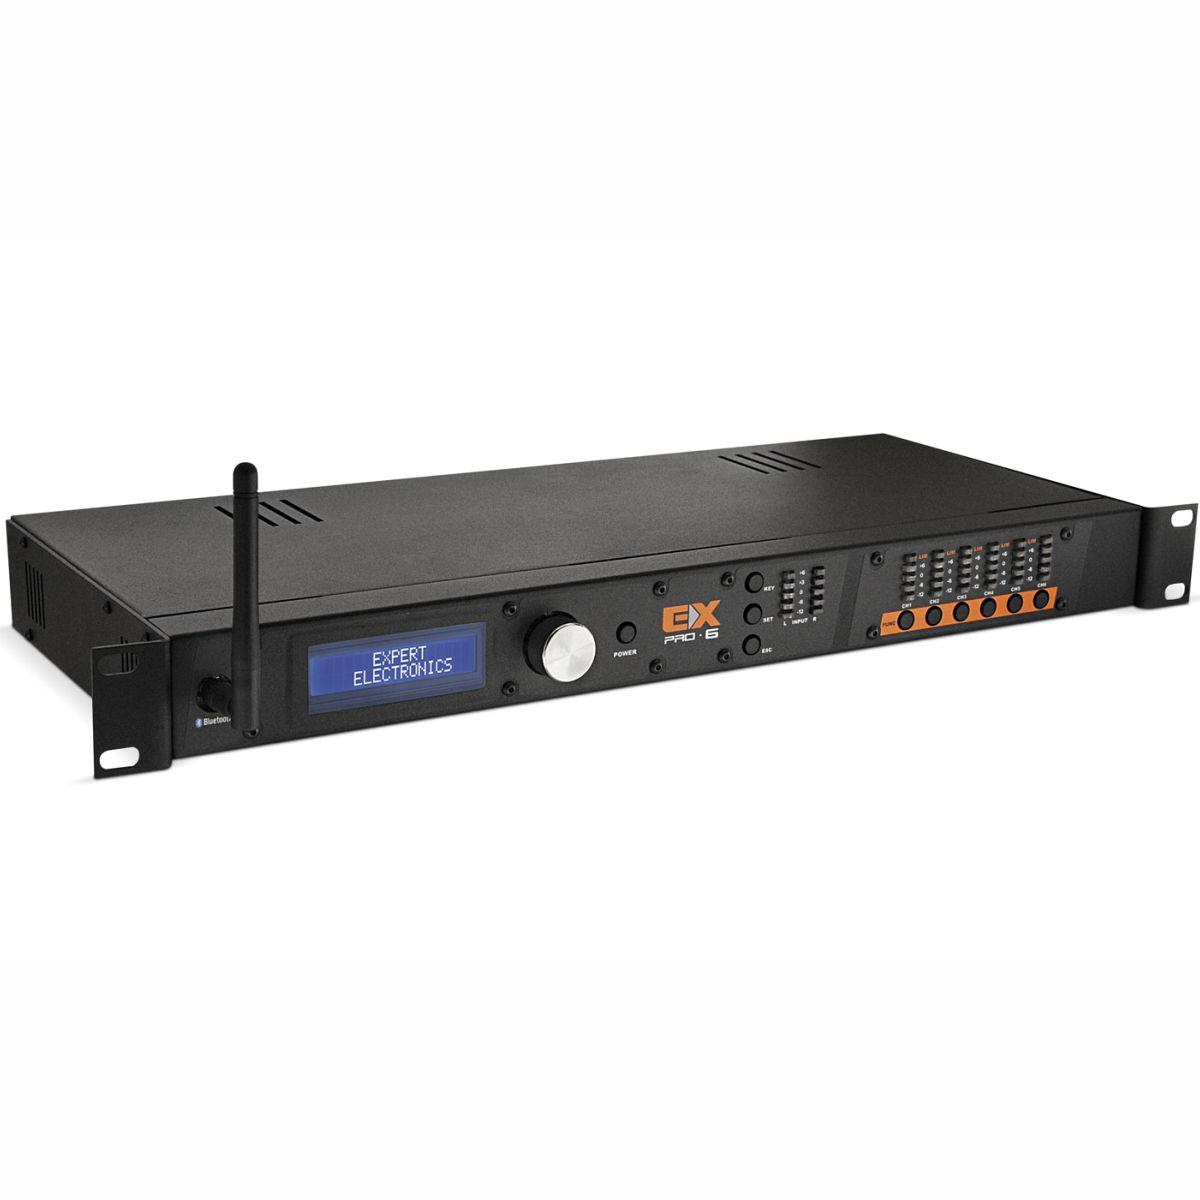 Processador de Áudio Banda Expert Electronics PRO 6 Connect 6 Vias